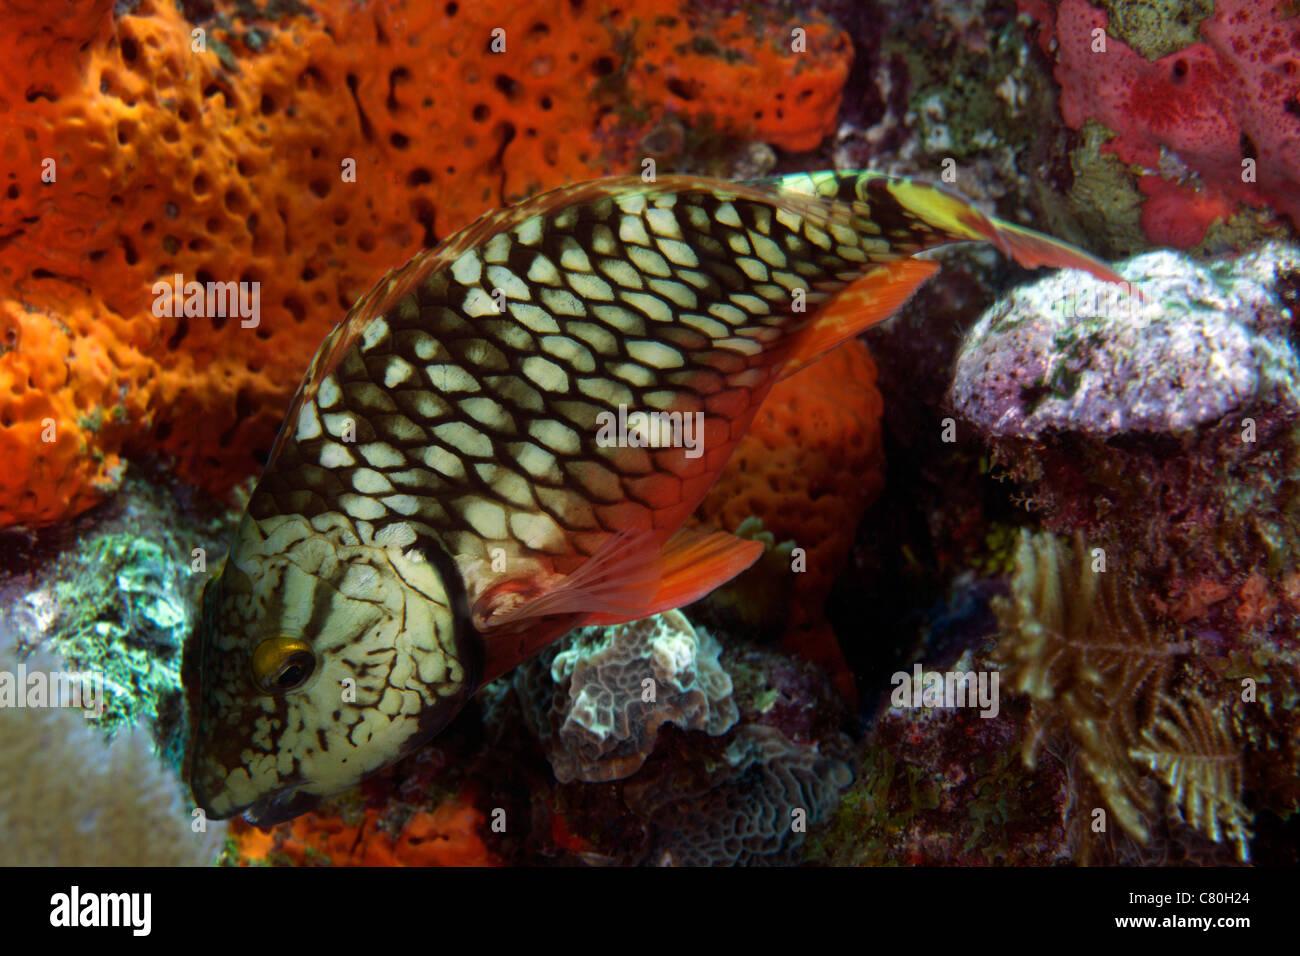 Stoplight parrotfish (Sparisoma viride) feeding off the coral reef in the Atlantic Ocean off the coast of Key Largo, - Stock Image